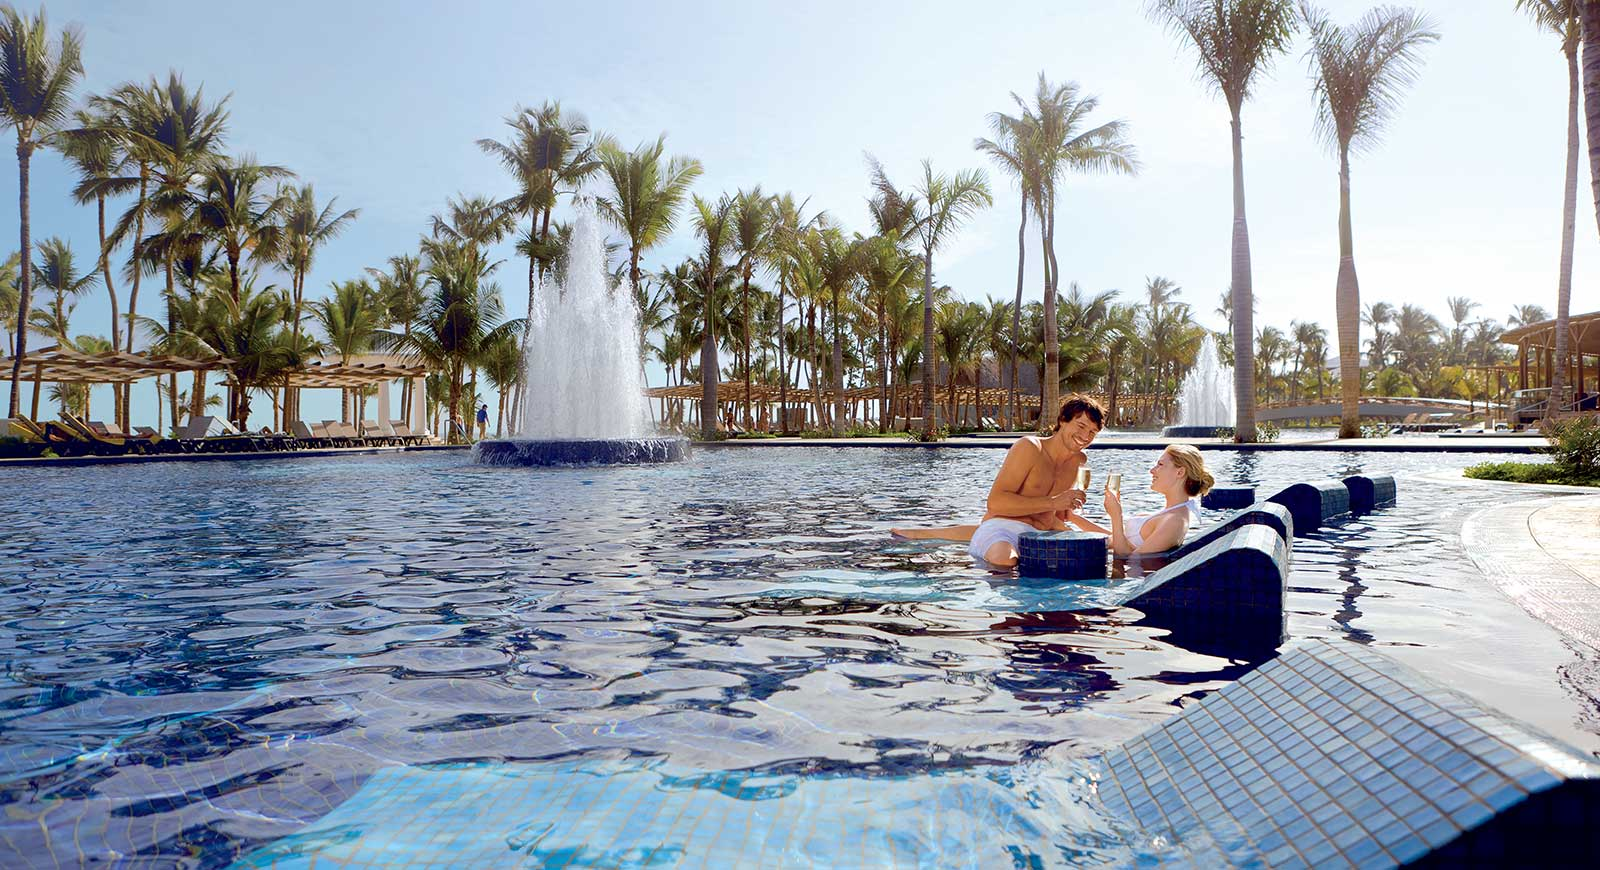 331-swimming-pool-hotel-barcelo-bavaro-palace-deluxe_tcm7-5043